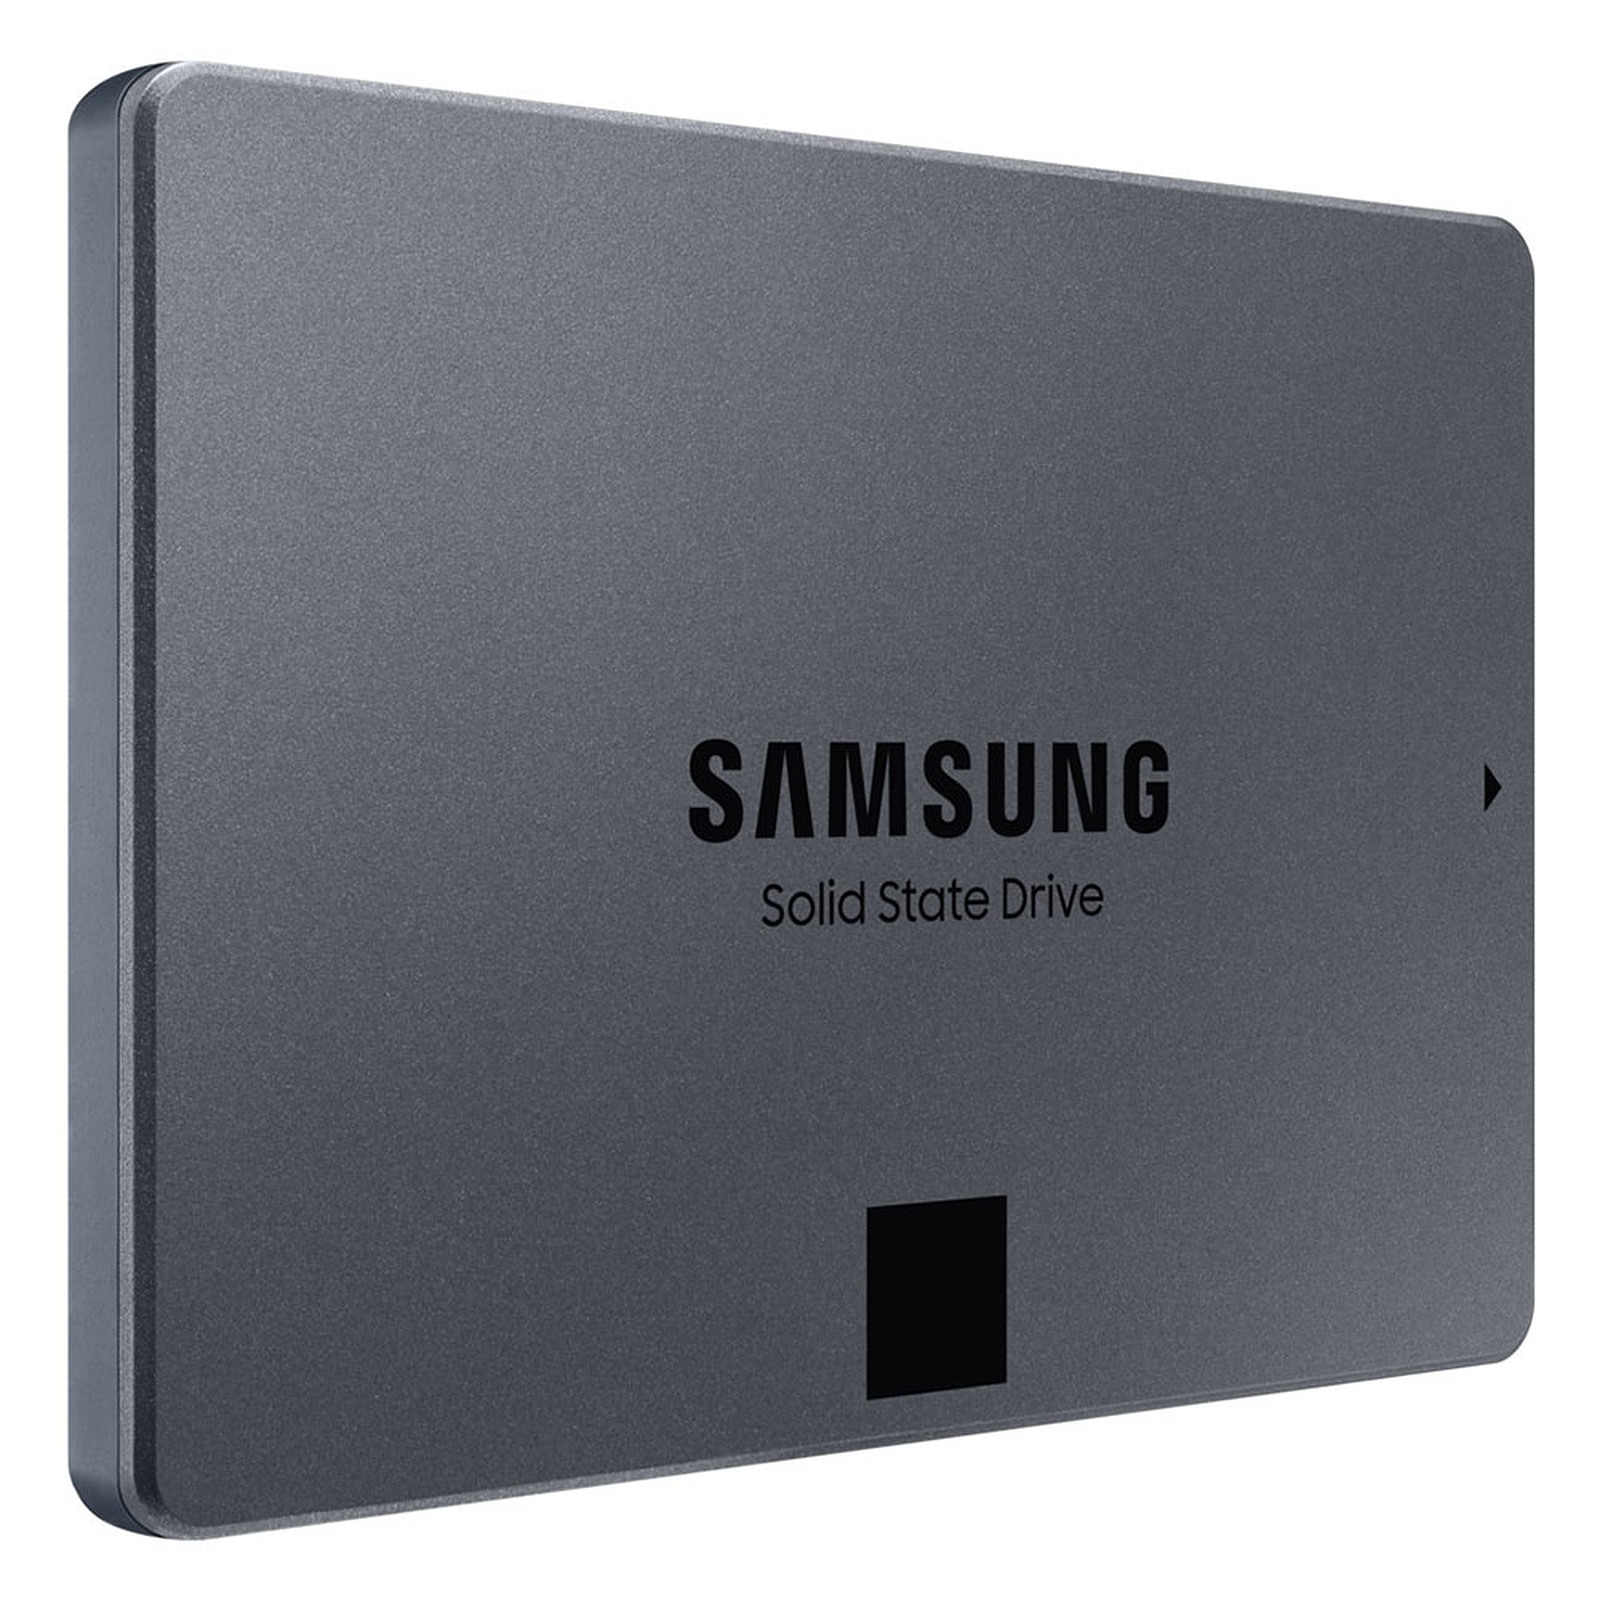 Samsung SSD 870 QVO 2 To